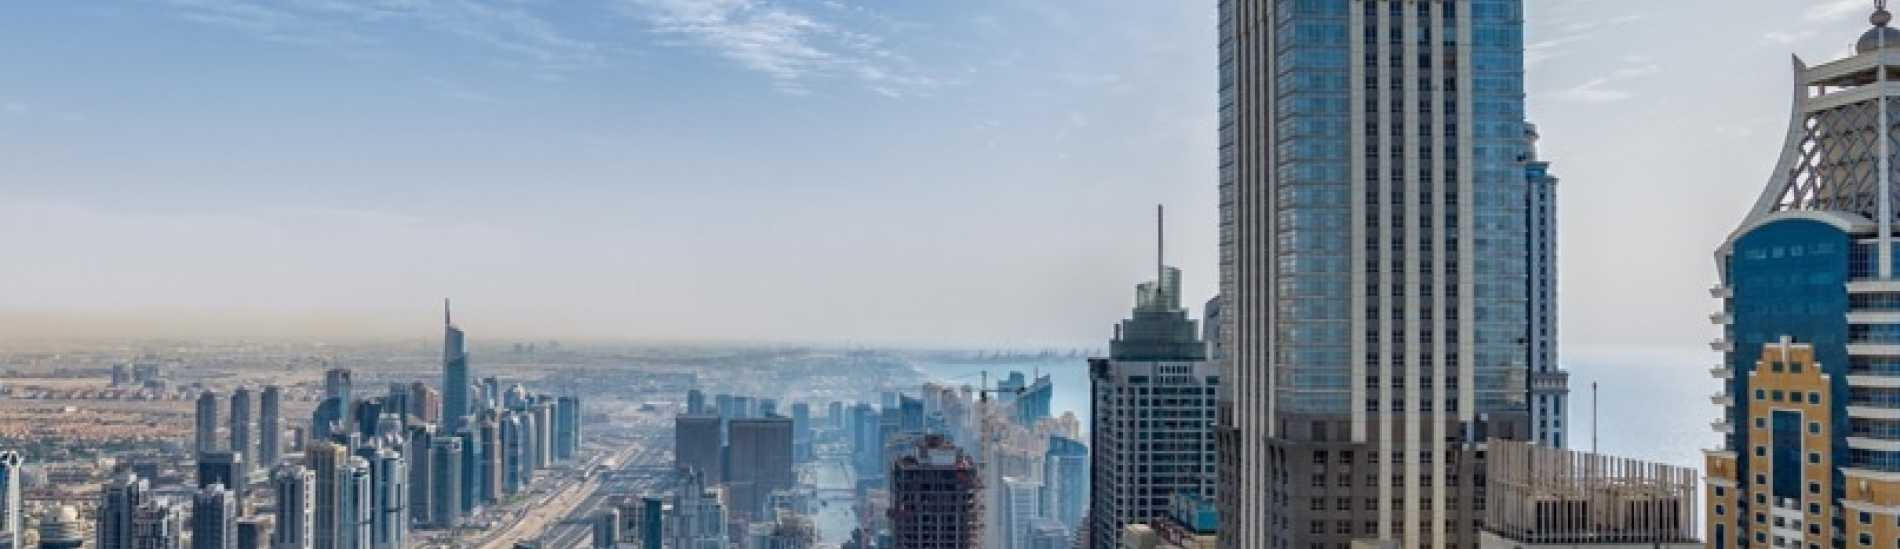 UAE Announces 100% Company Ownership & 10-Year Residence Visa